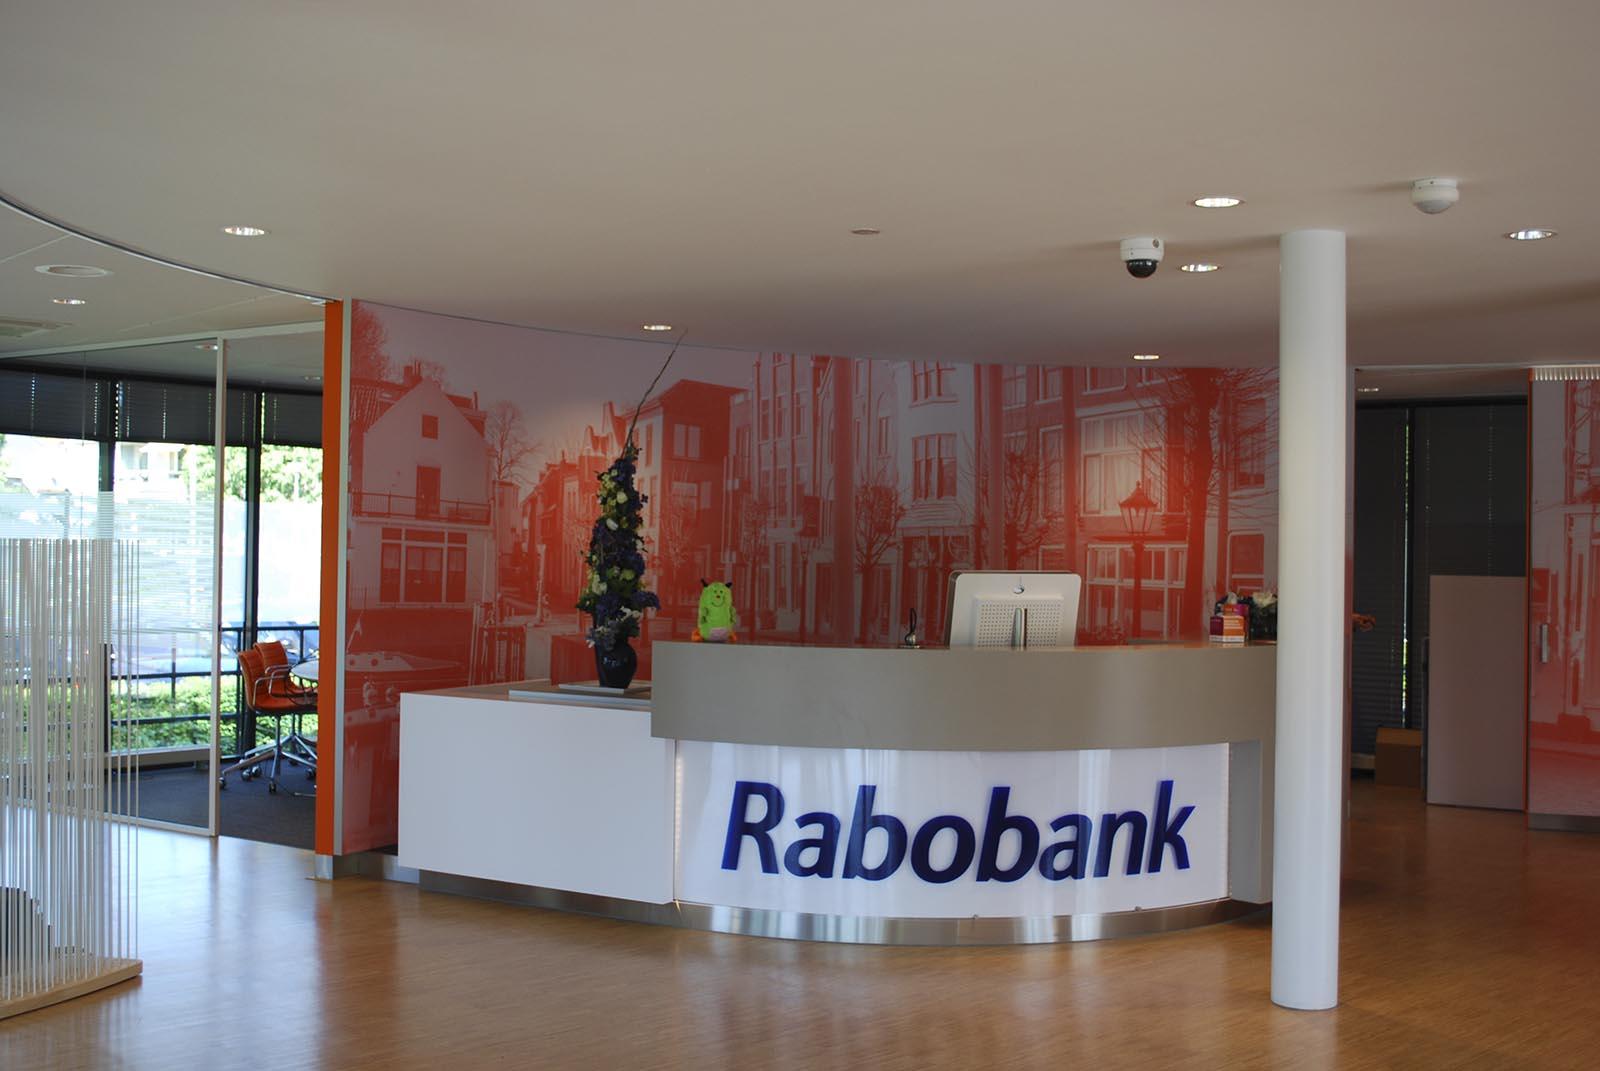 Rabobank receptie